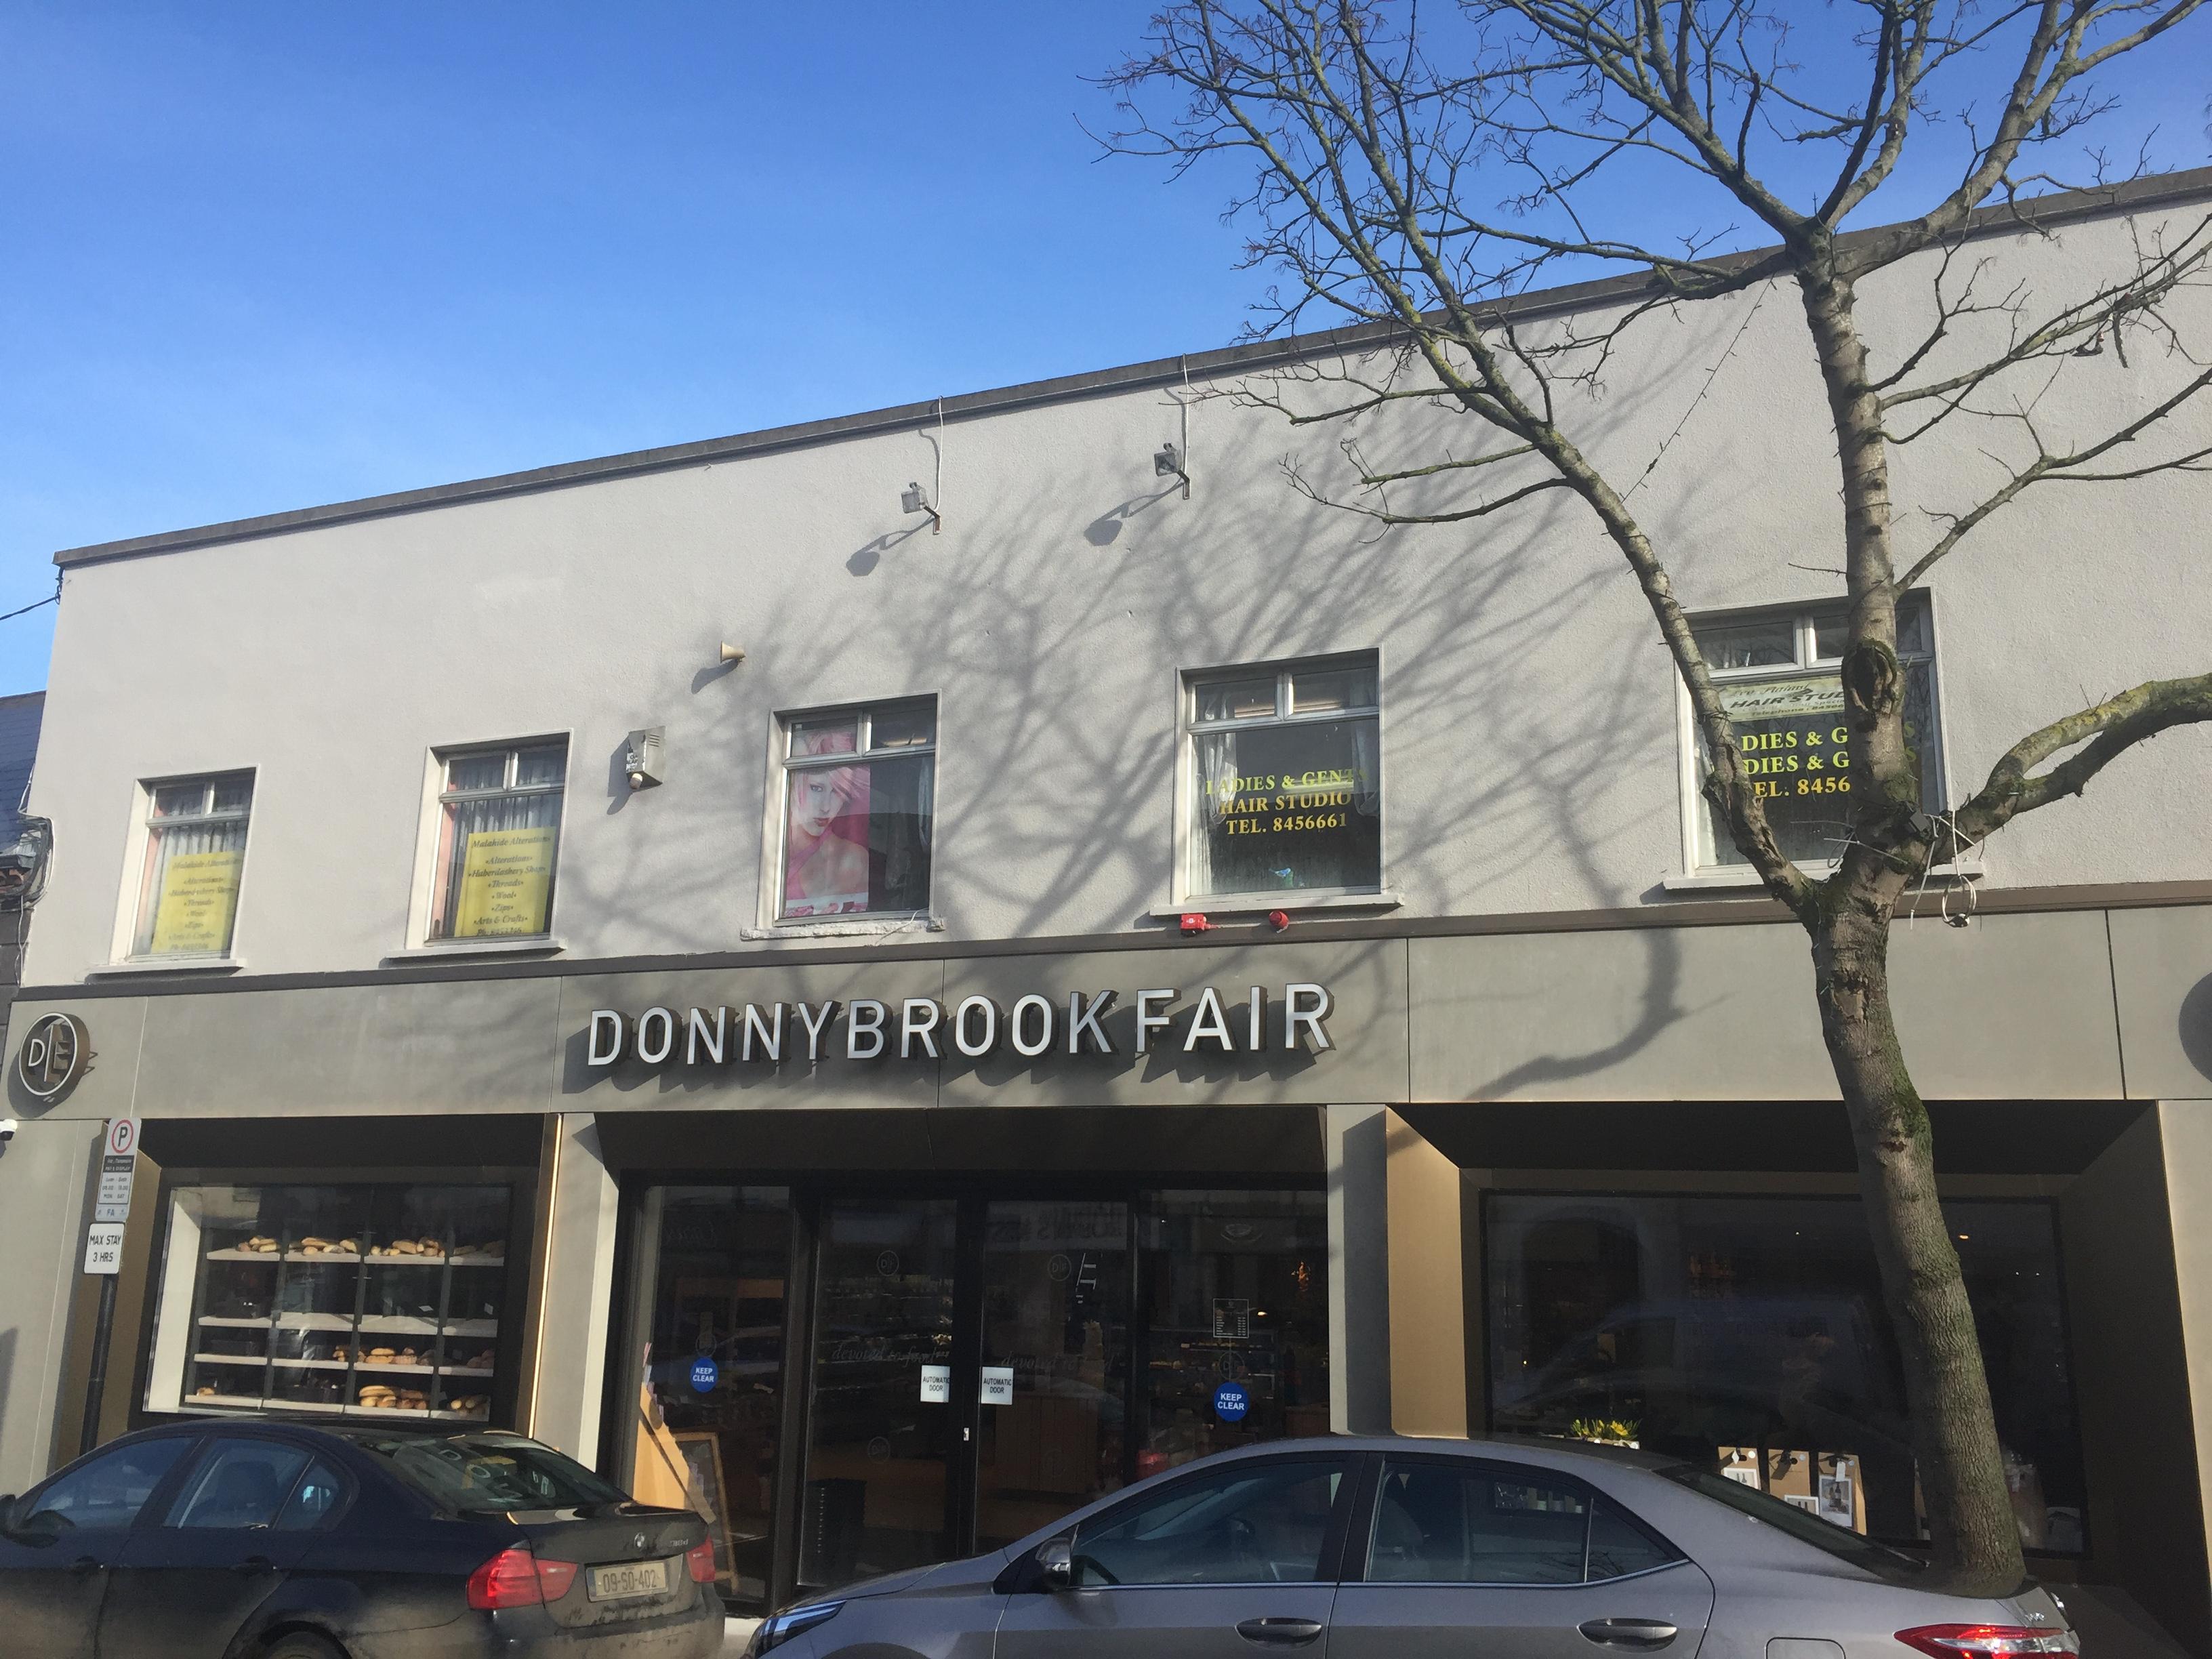 Commercial - IKO Bitumen - Donnybrook fair - Monami (1)